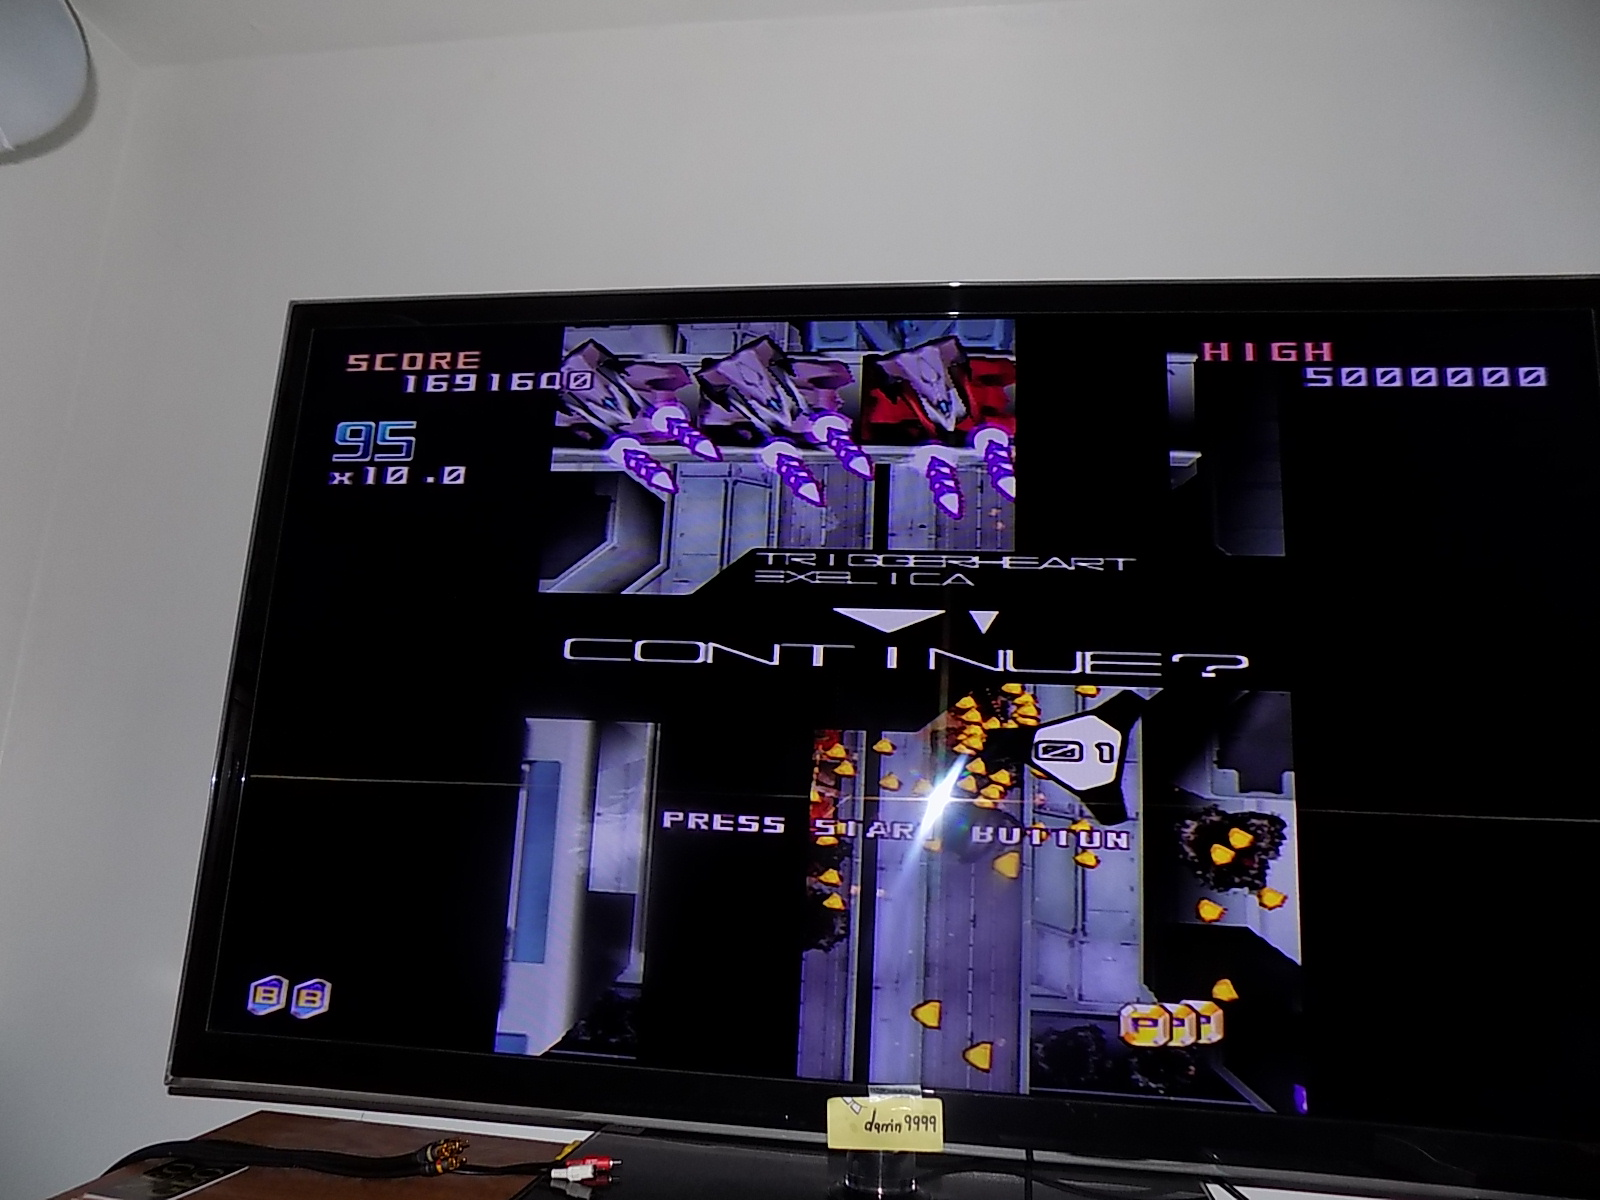 darrin9999: Triggerheart Exelica [Arcade Mode] (Dreamcast) 1,691,640 points on 2019-11-11 10:59:19